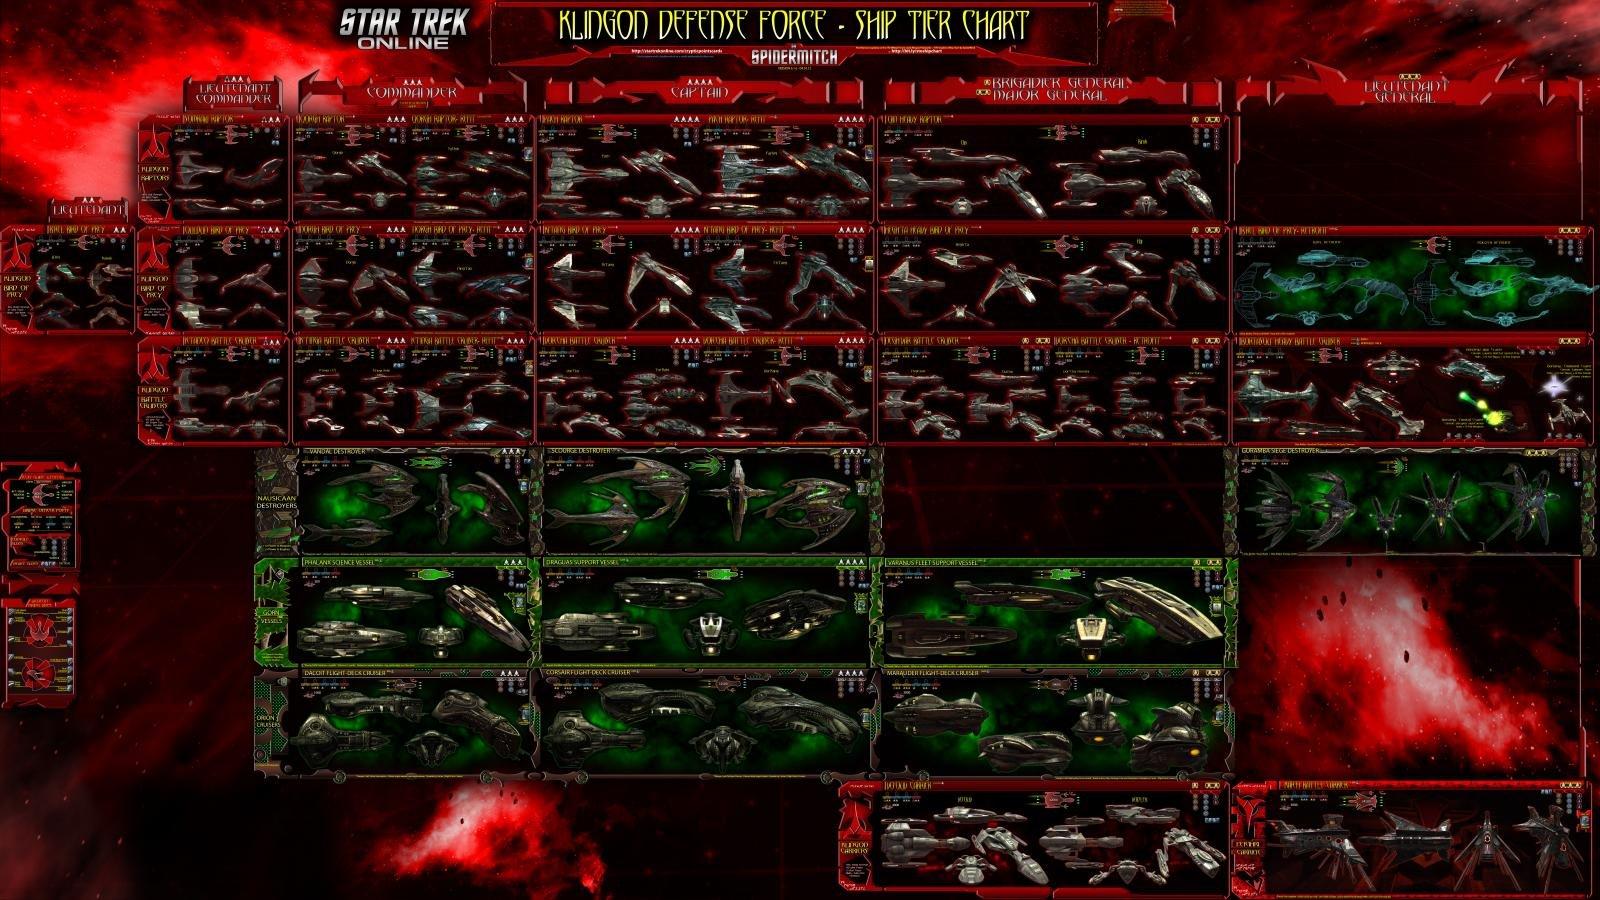 High Resolution Star Trek Video Game Hd 1600x900 Background Id276298 For Desktop